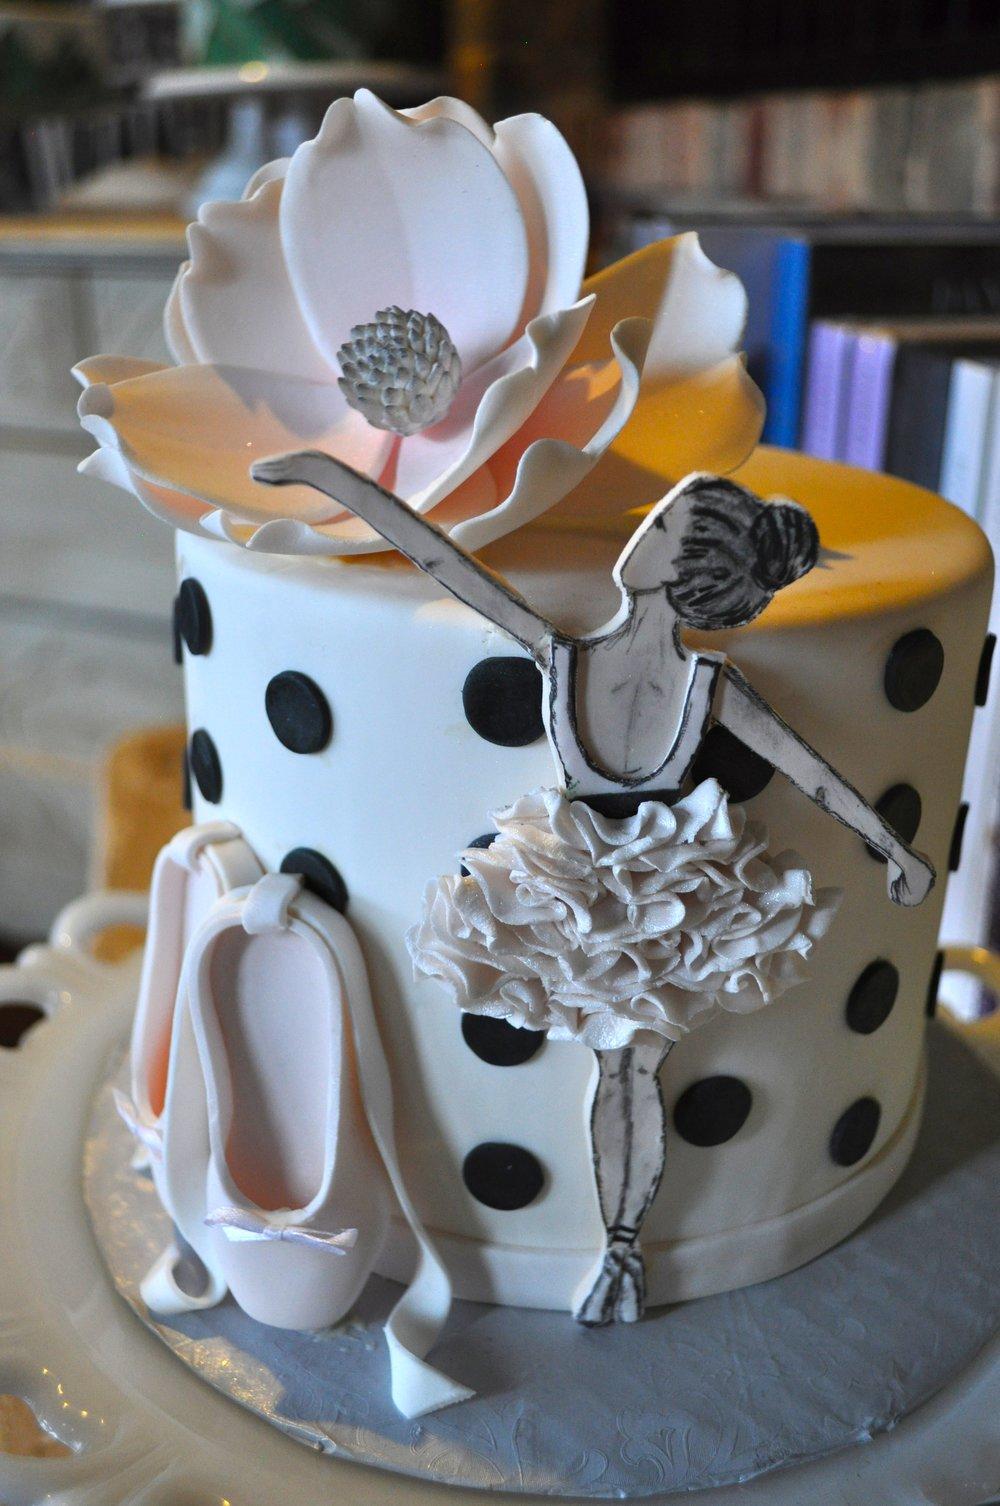 Ballerina Shop Cake.jpg